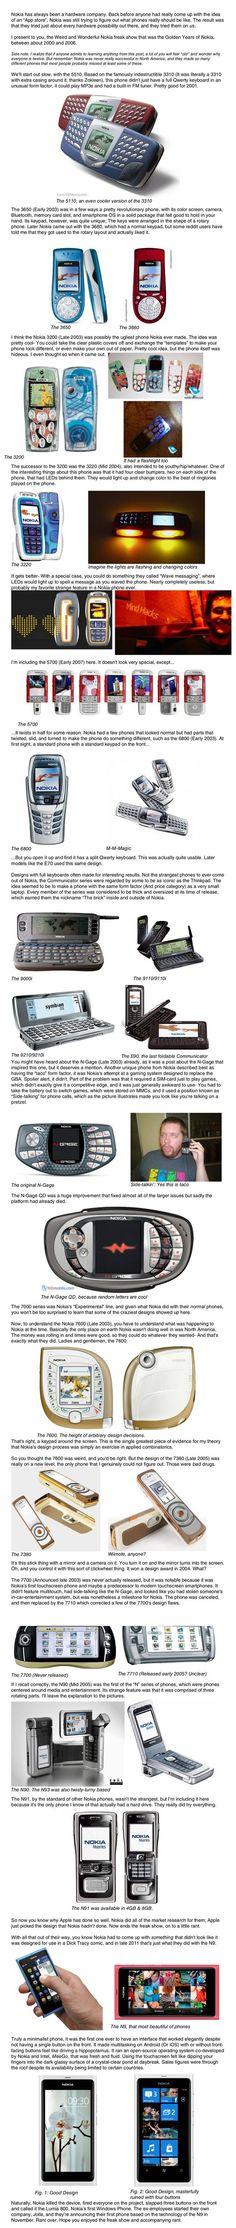 Nokia innovations